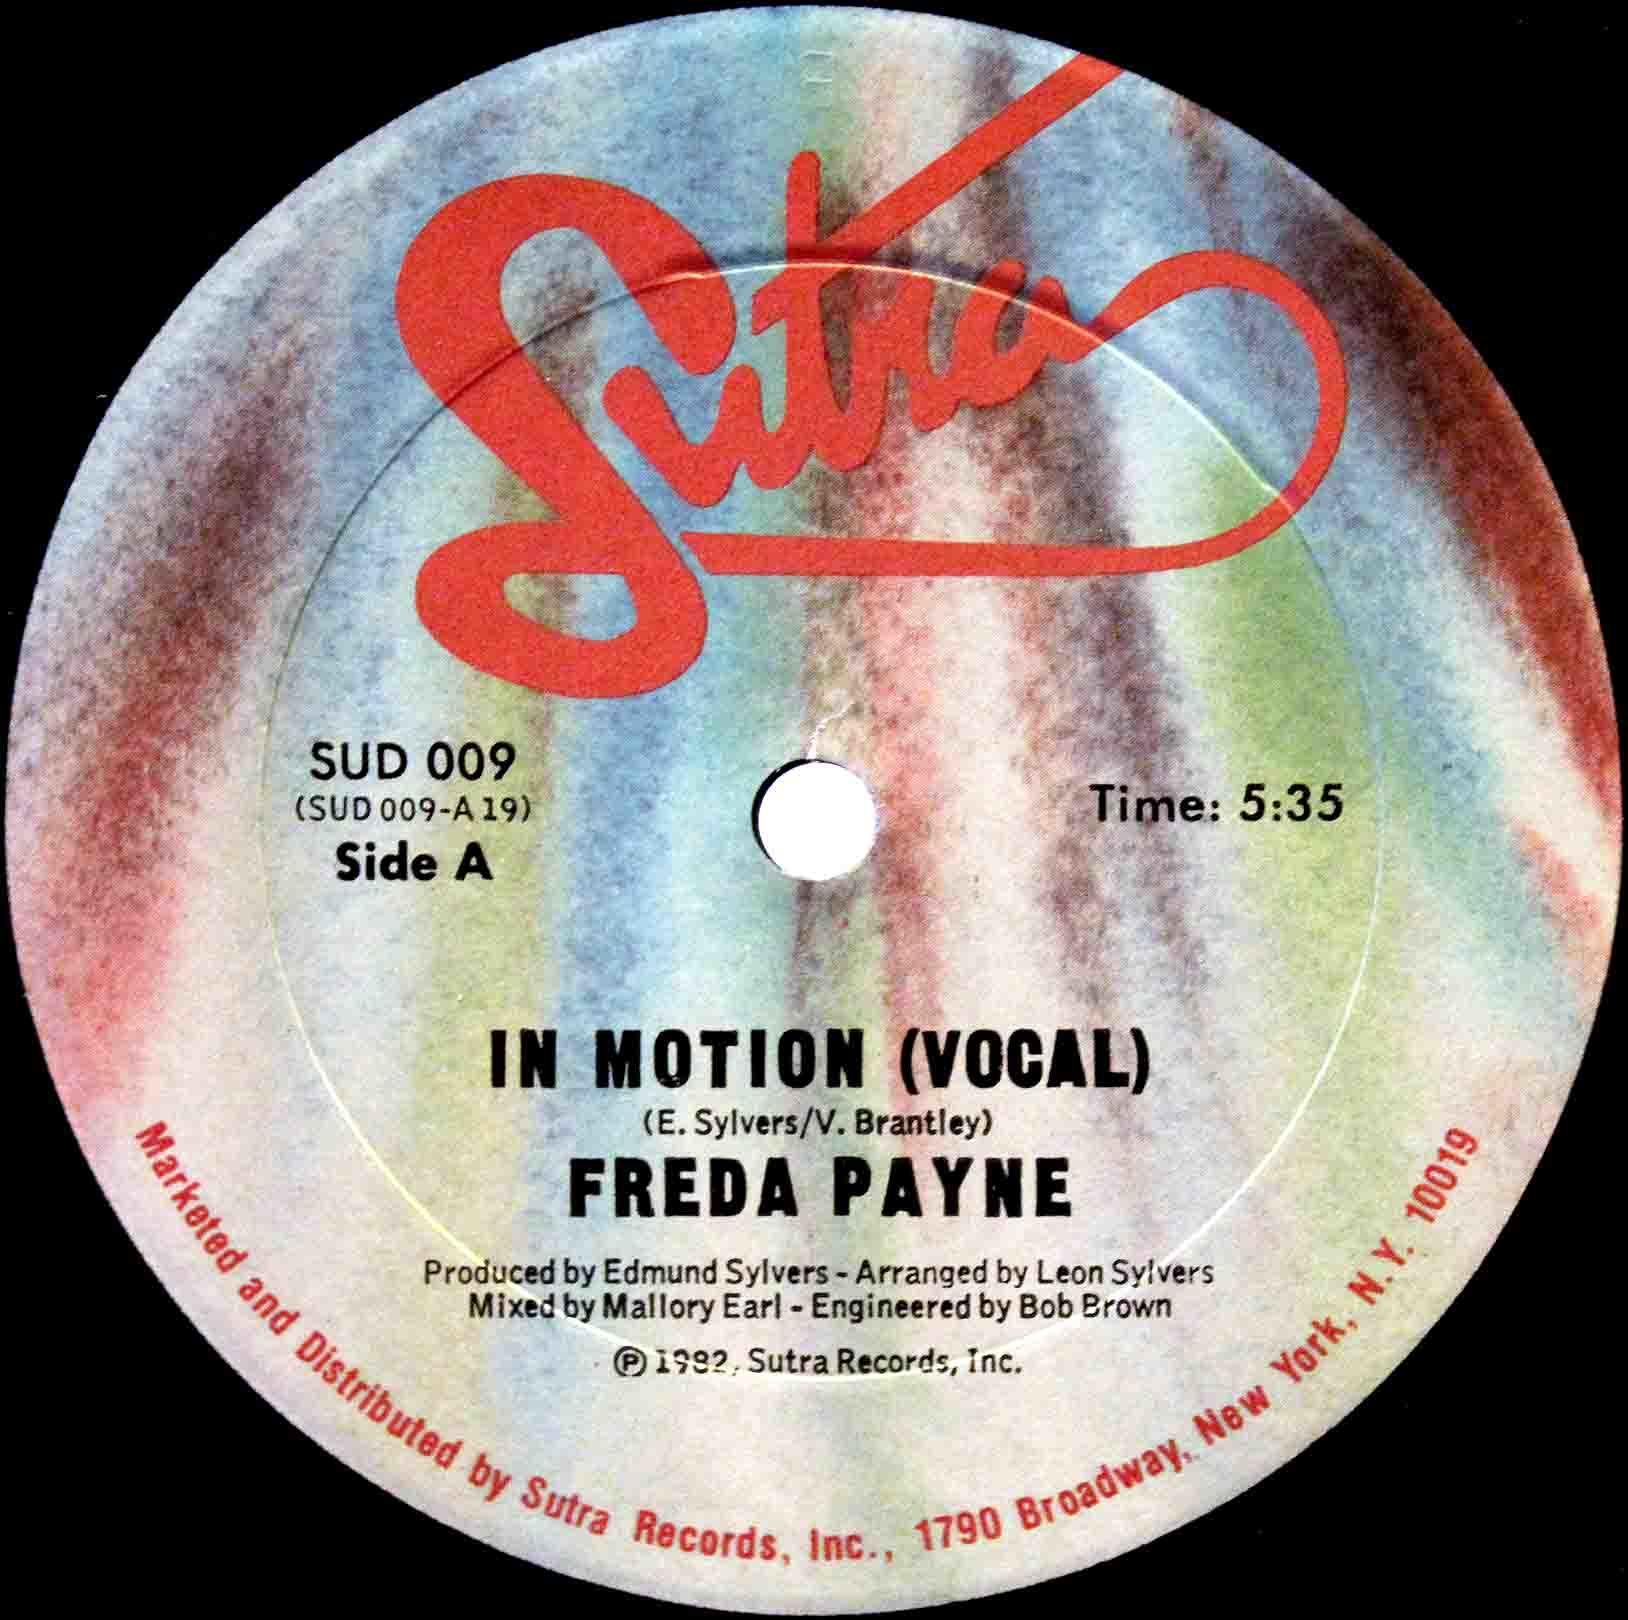 Freda Payne - In Motion 03